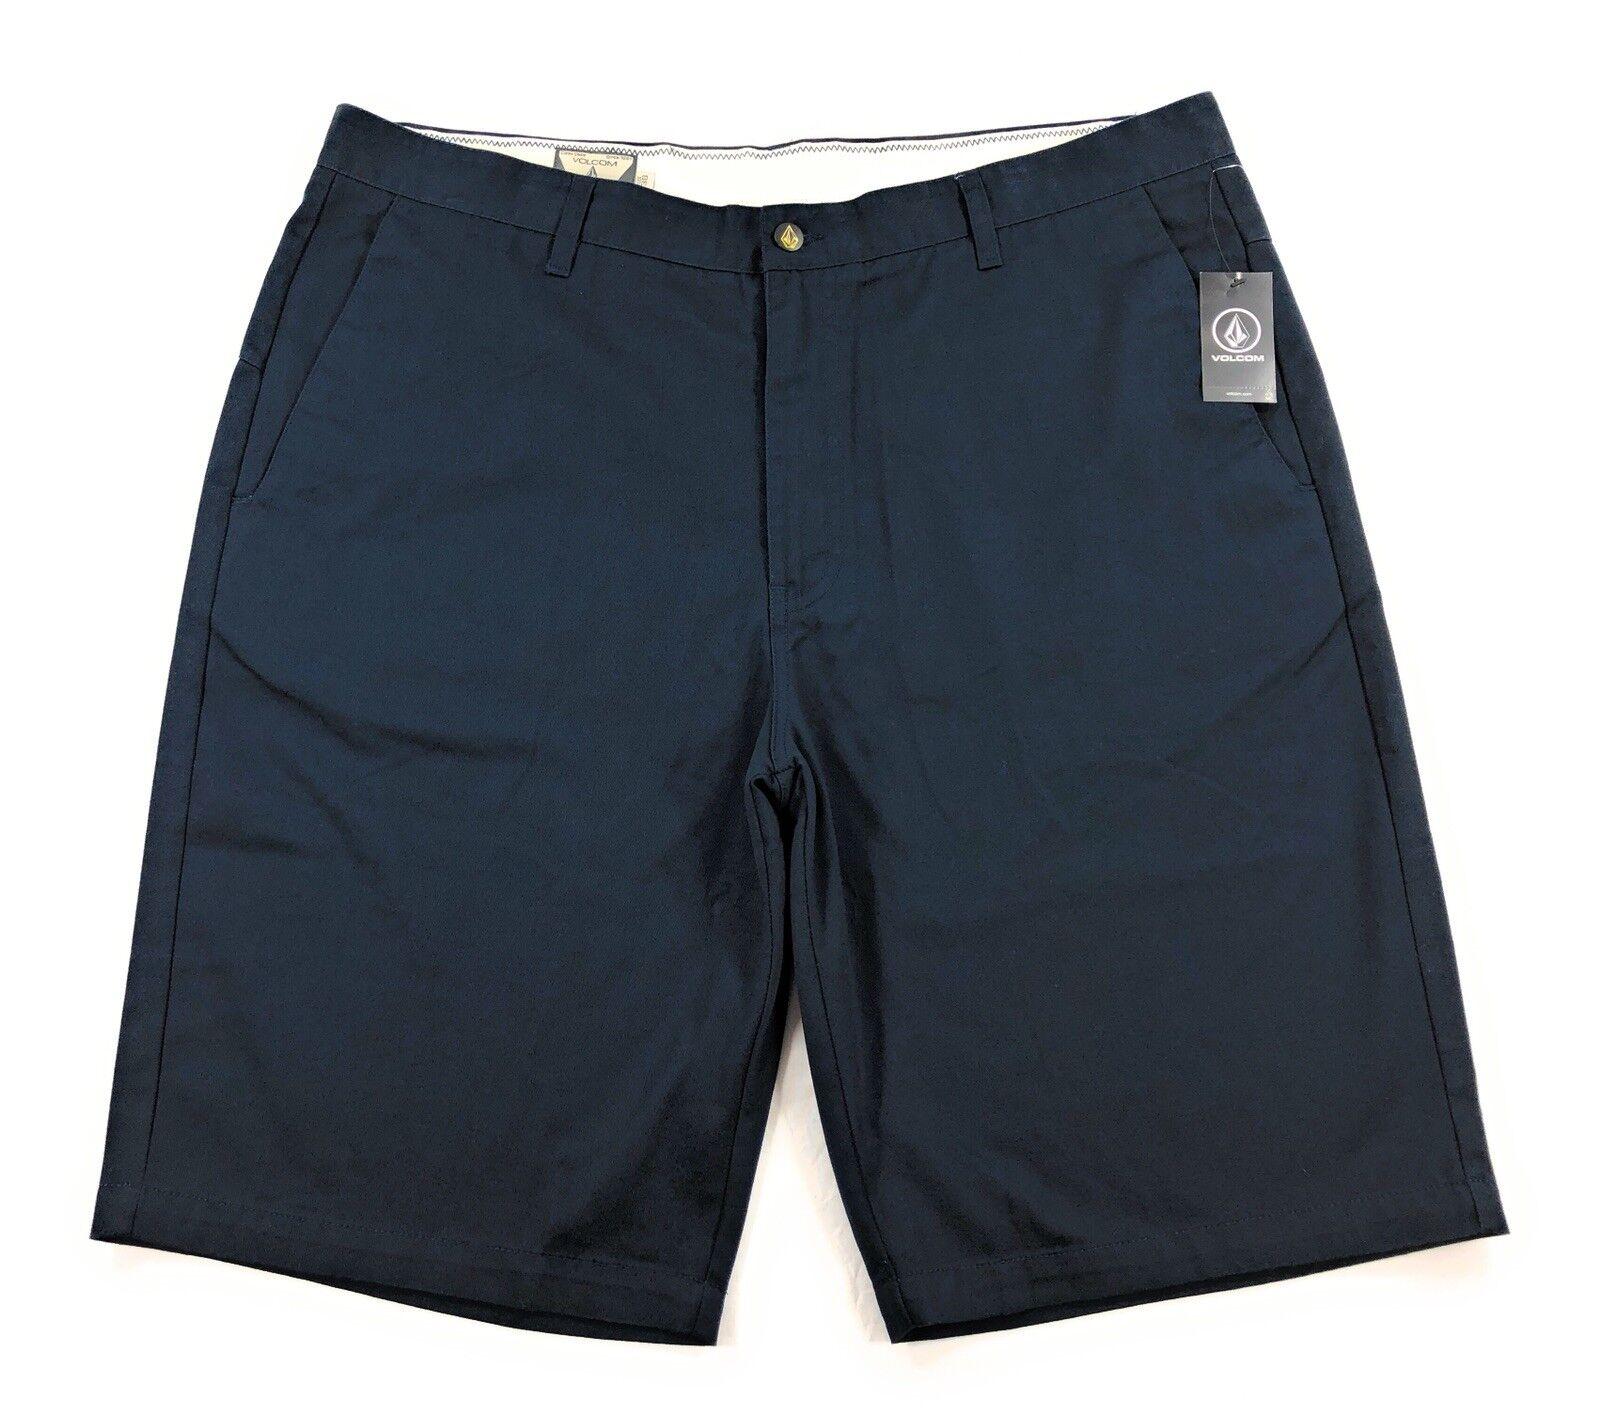 Volcom Vmonty Shorts Mens Navy bluee Flat Front